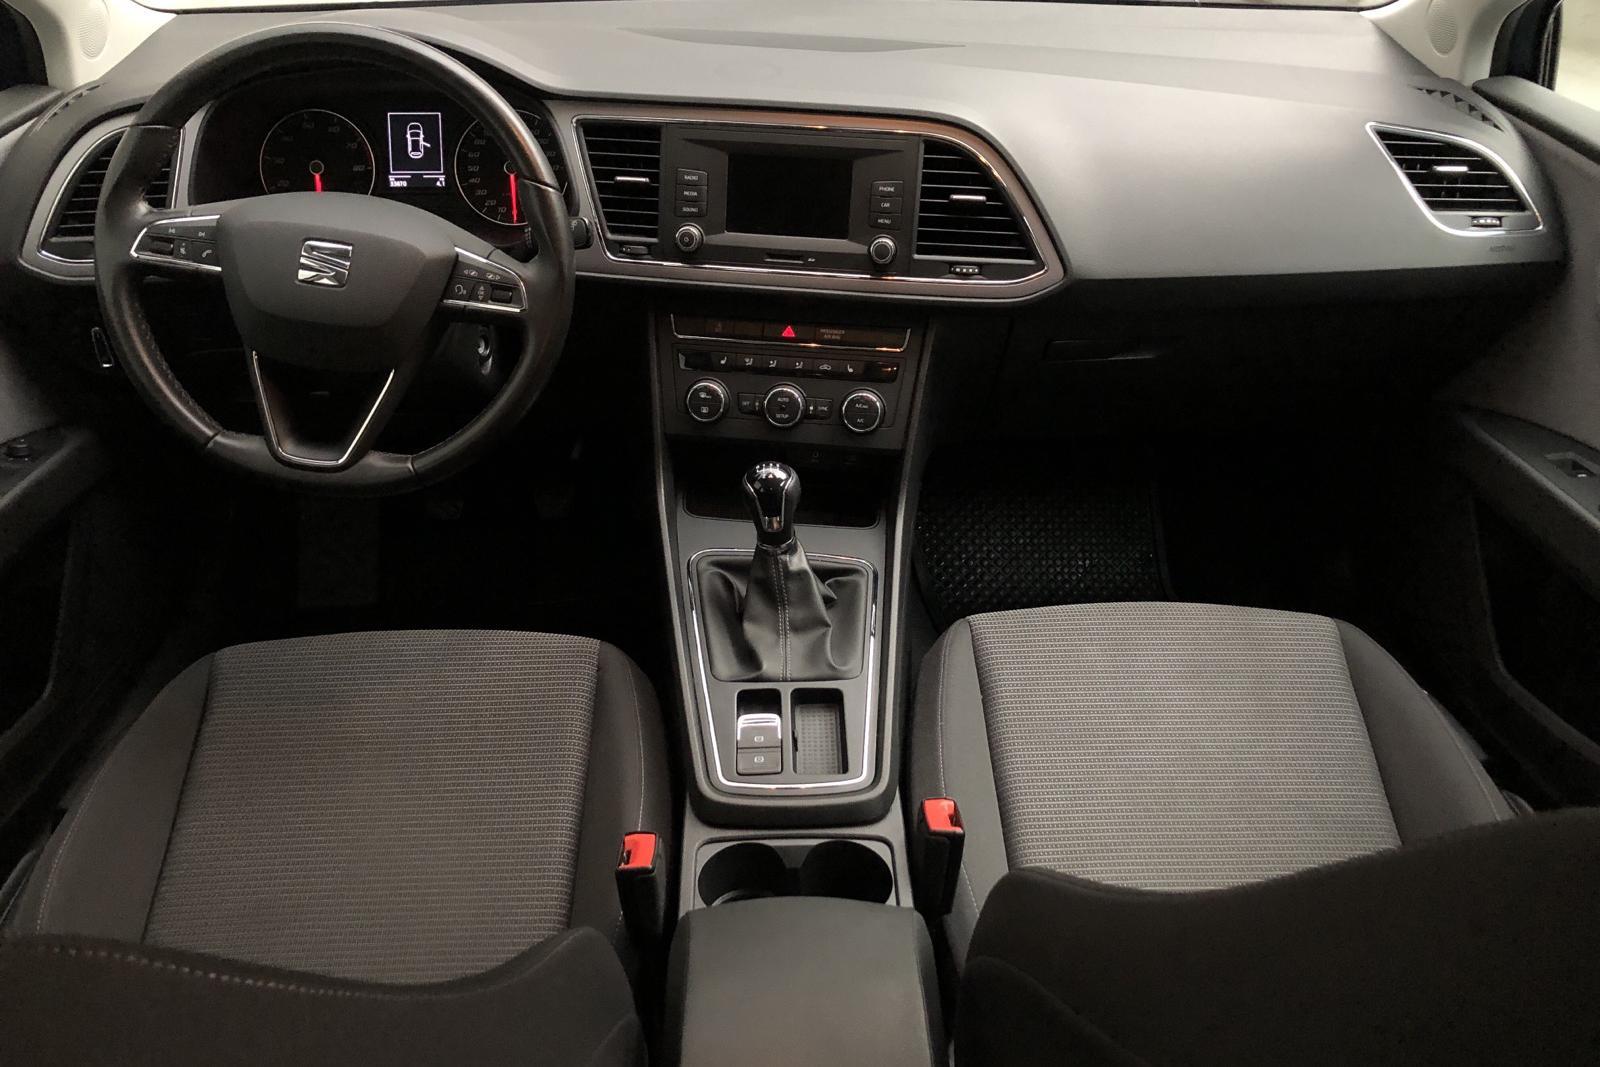 Seat Leon 1.2 TSI ST (110hk) - 33 860 km - Manual - blue - 2018